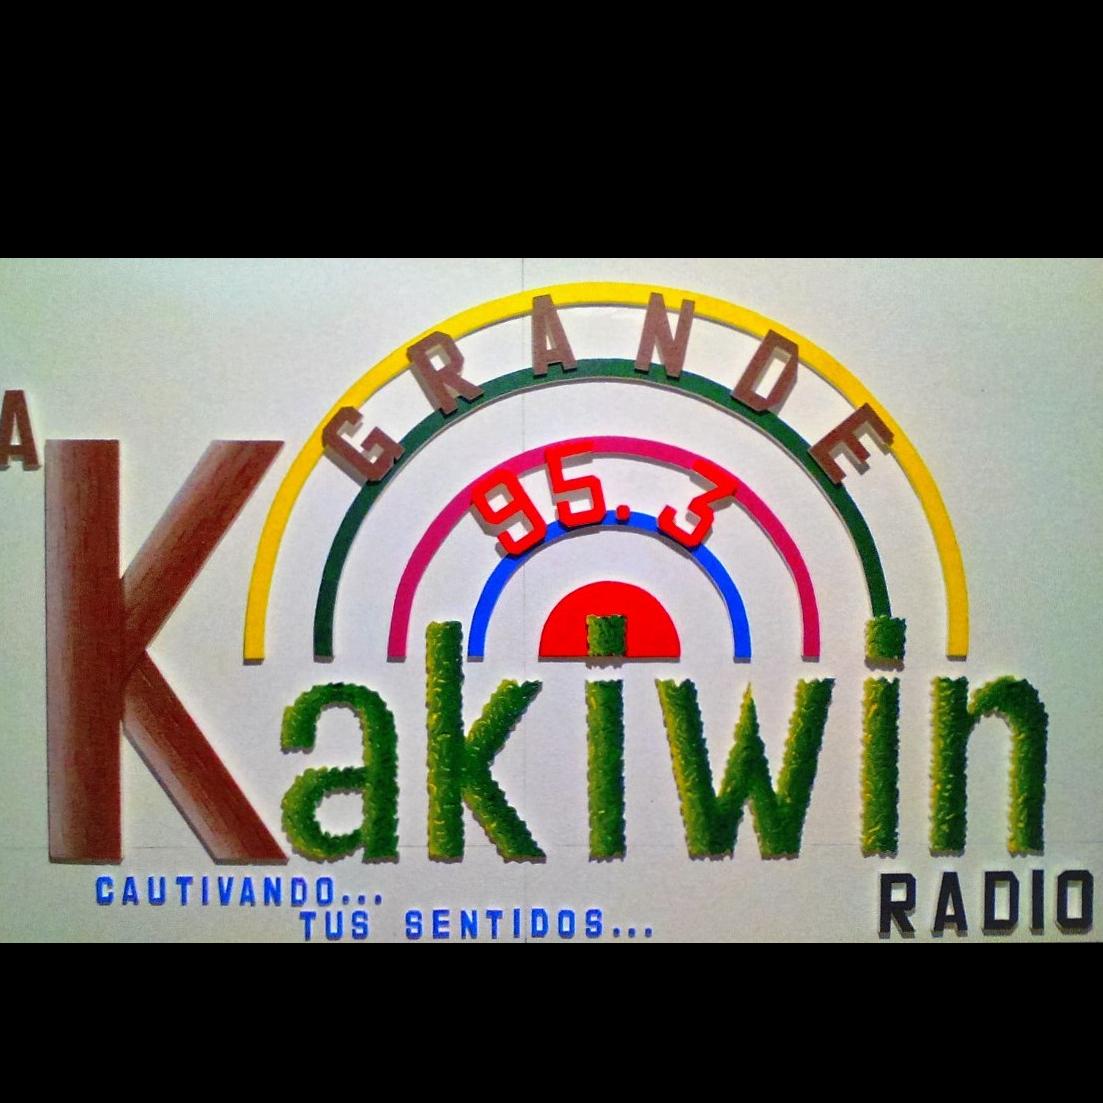 Kakiwin Radio